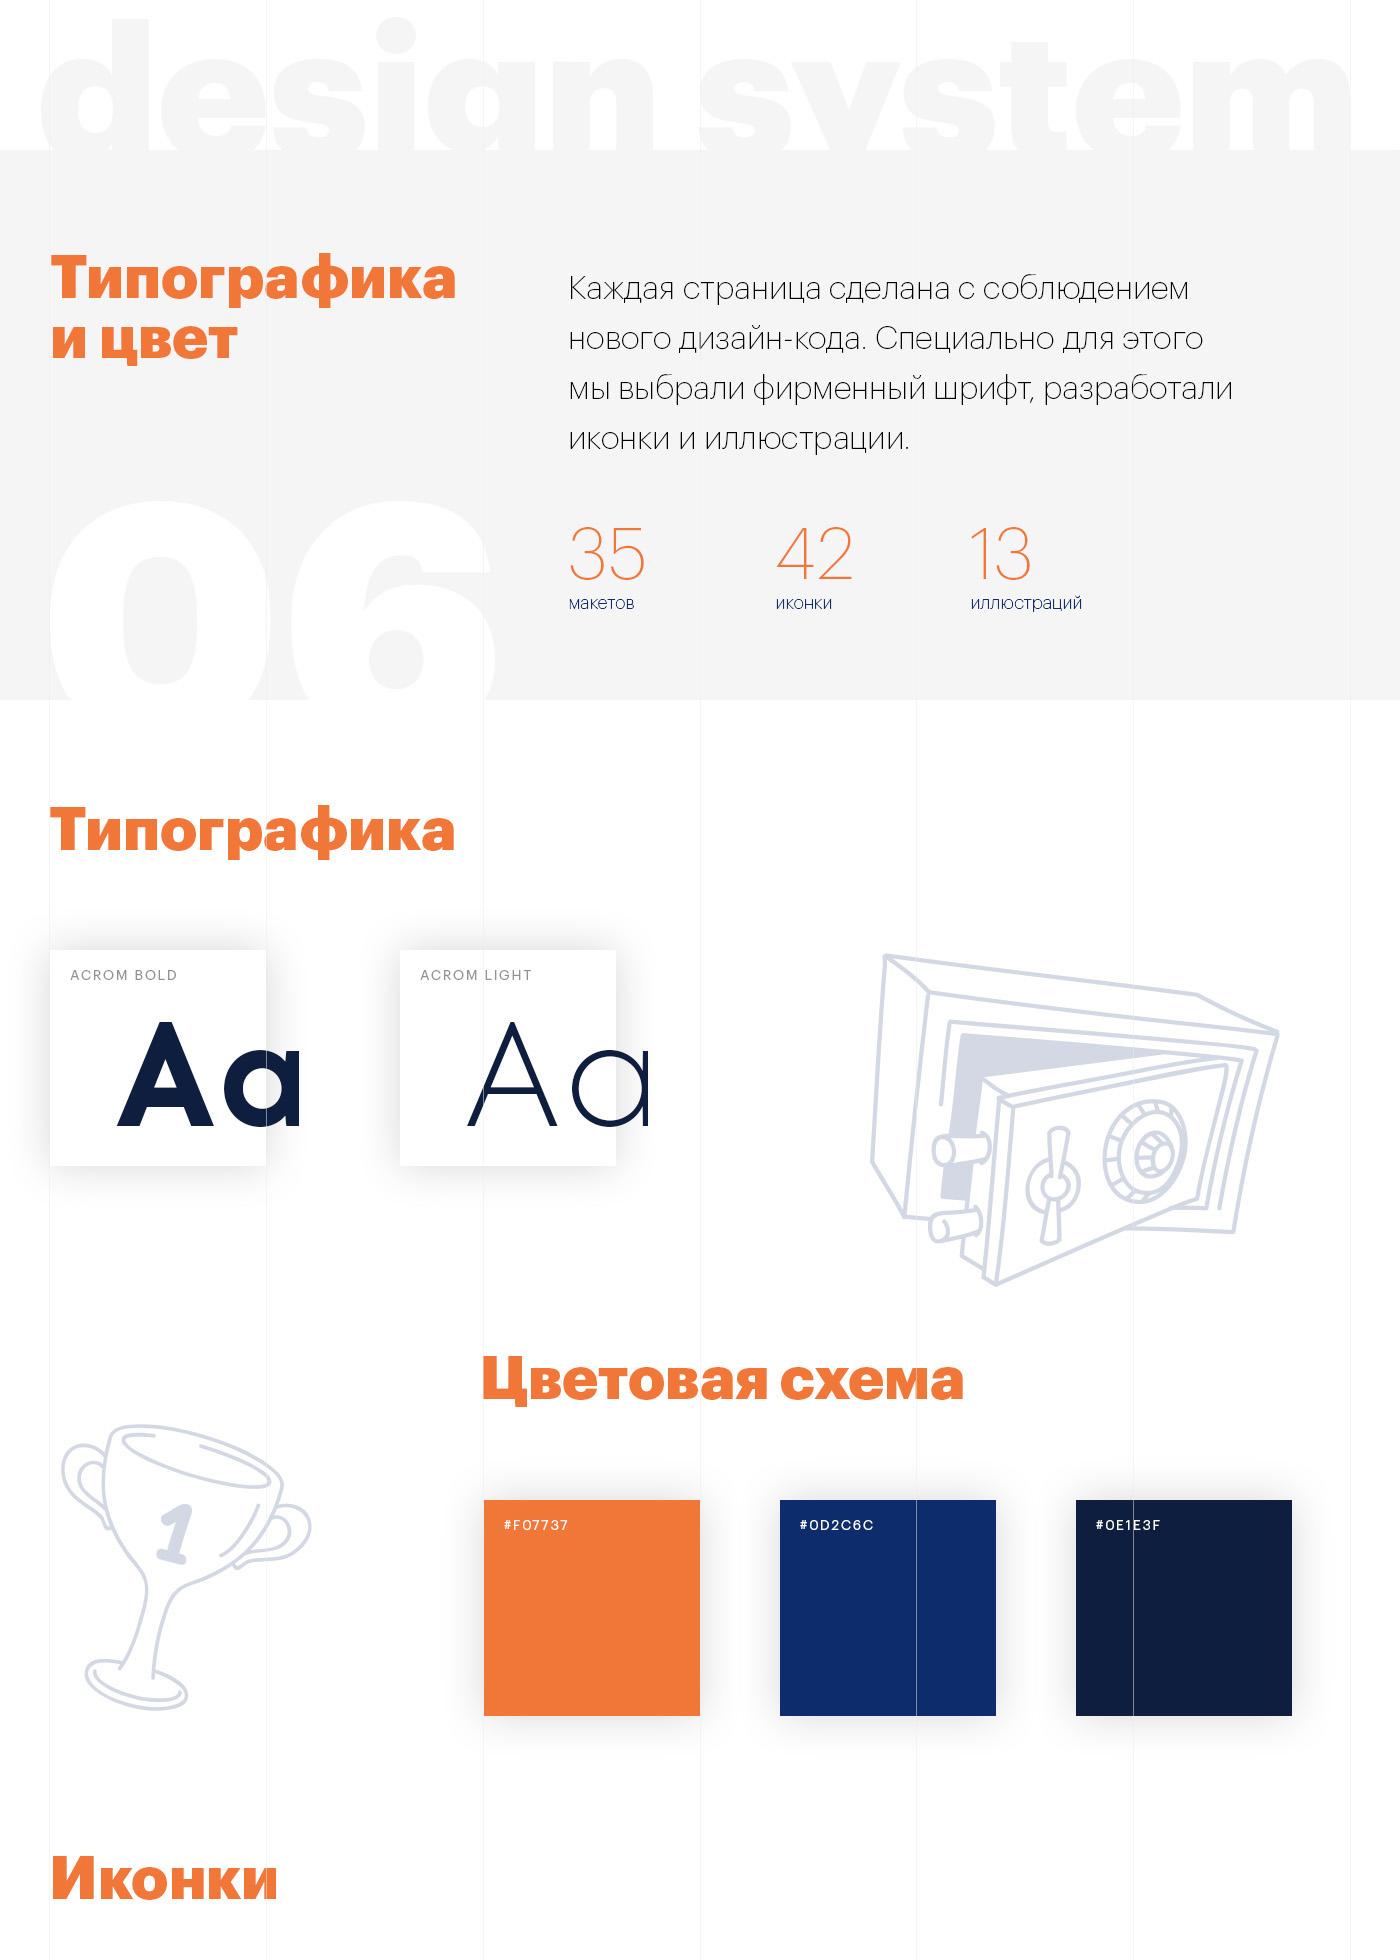 Web design insurance itech animation  UI web-design life